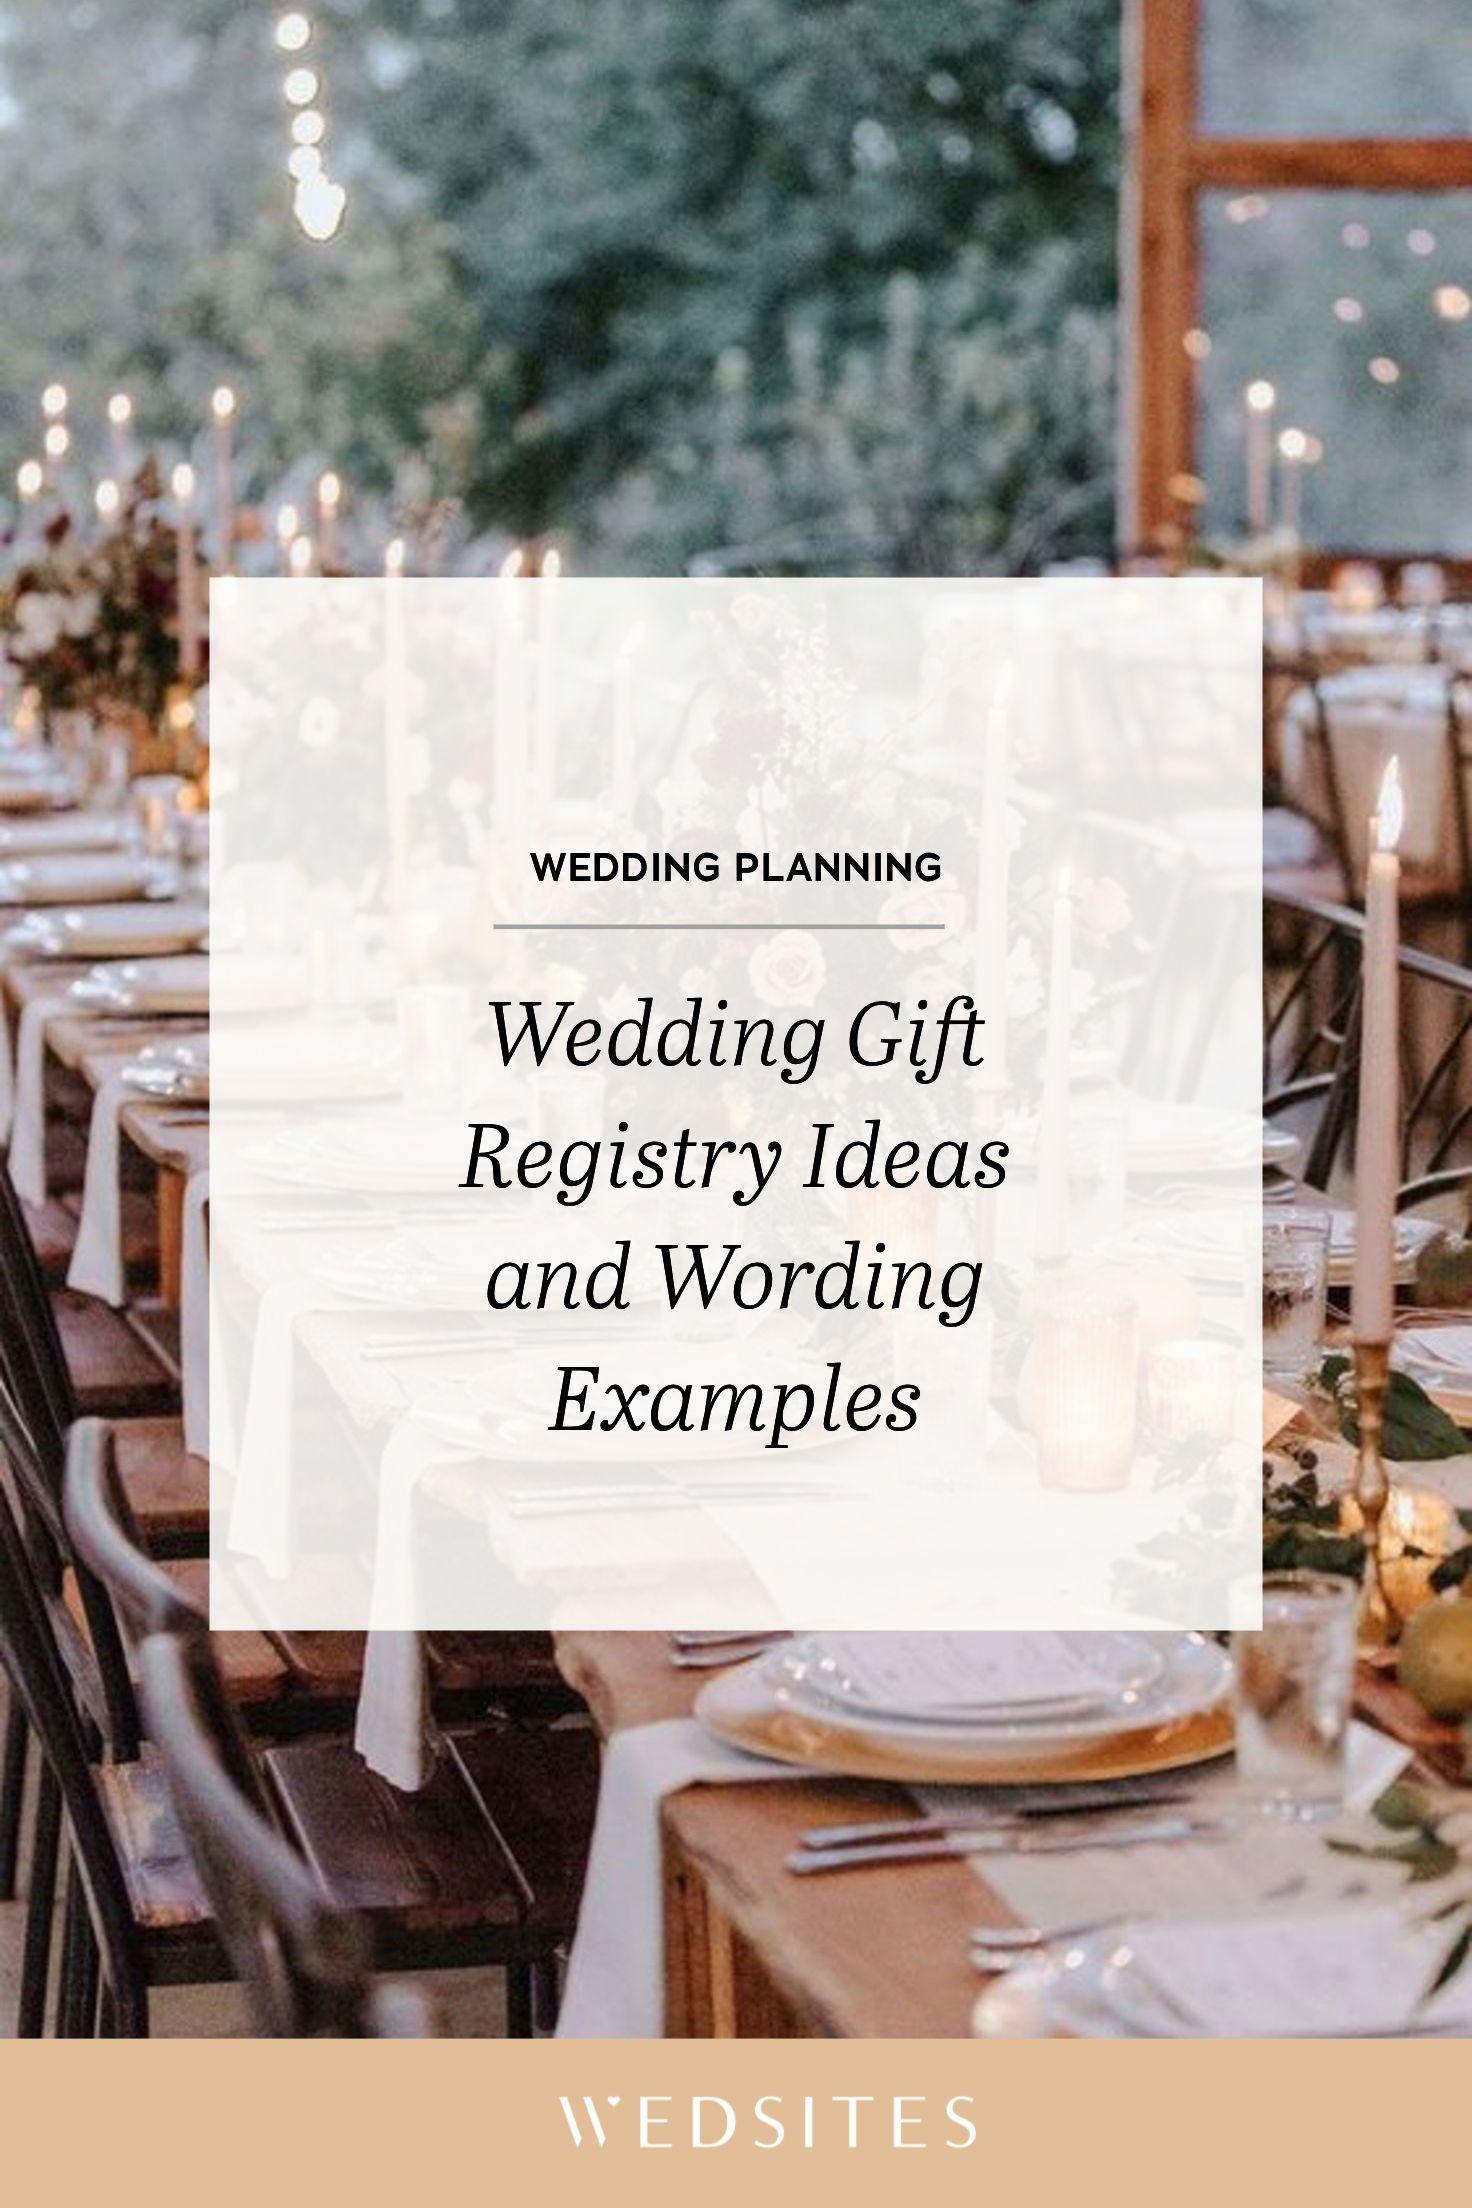 Wedding Gift Registry Ideas And Wording Examples In 2020 Online Wedding Planner Wedding Registry Advice Wedding Registry Examples